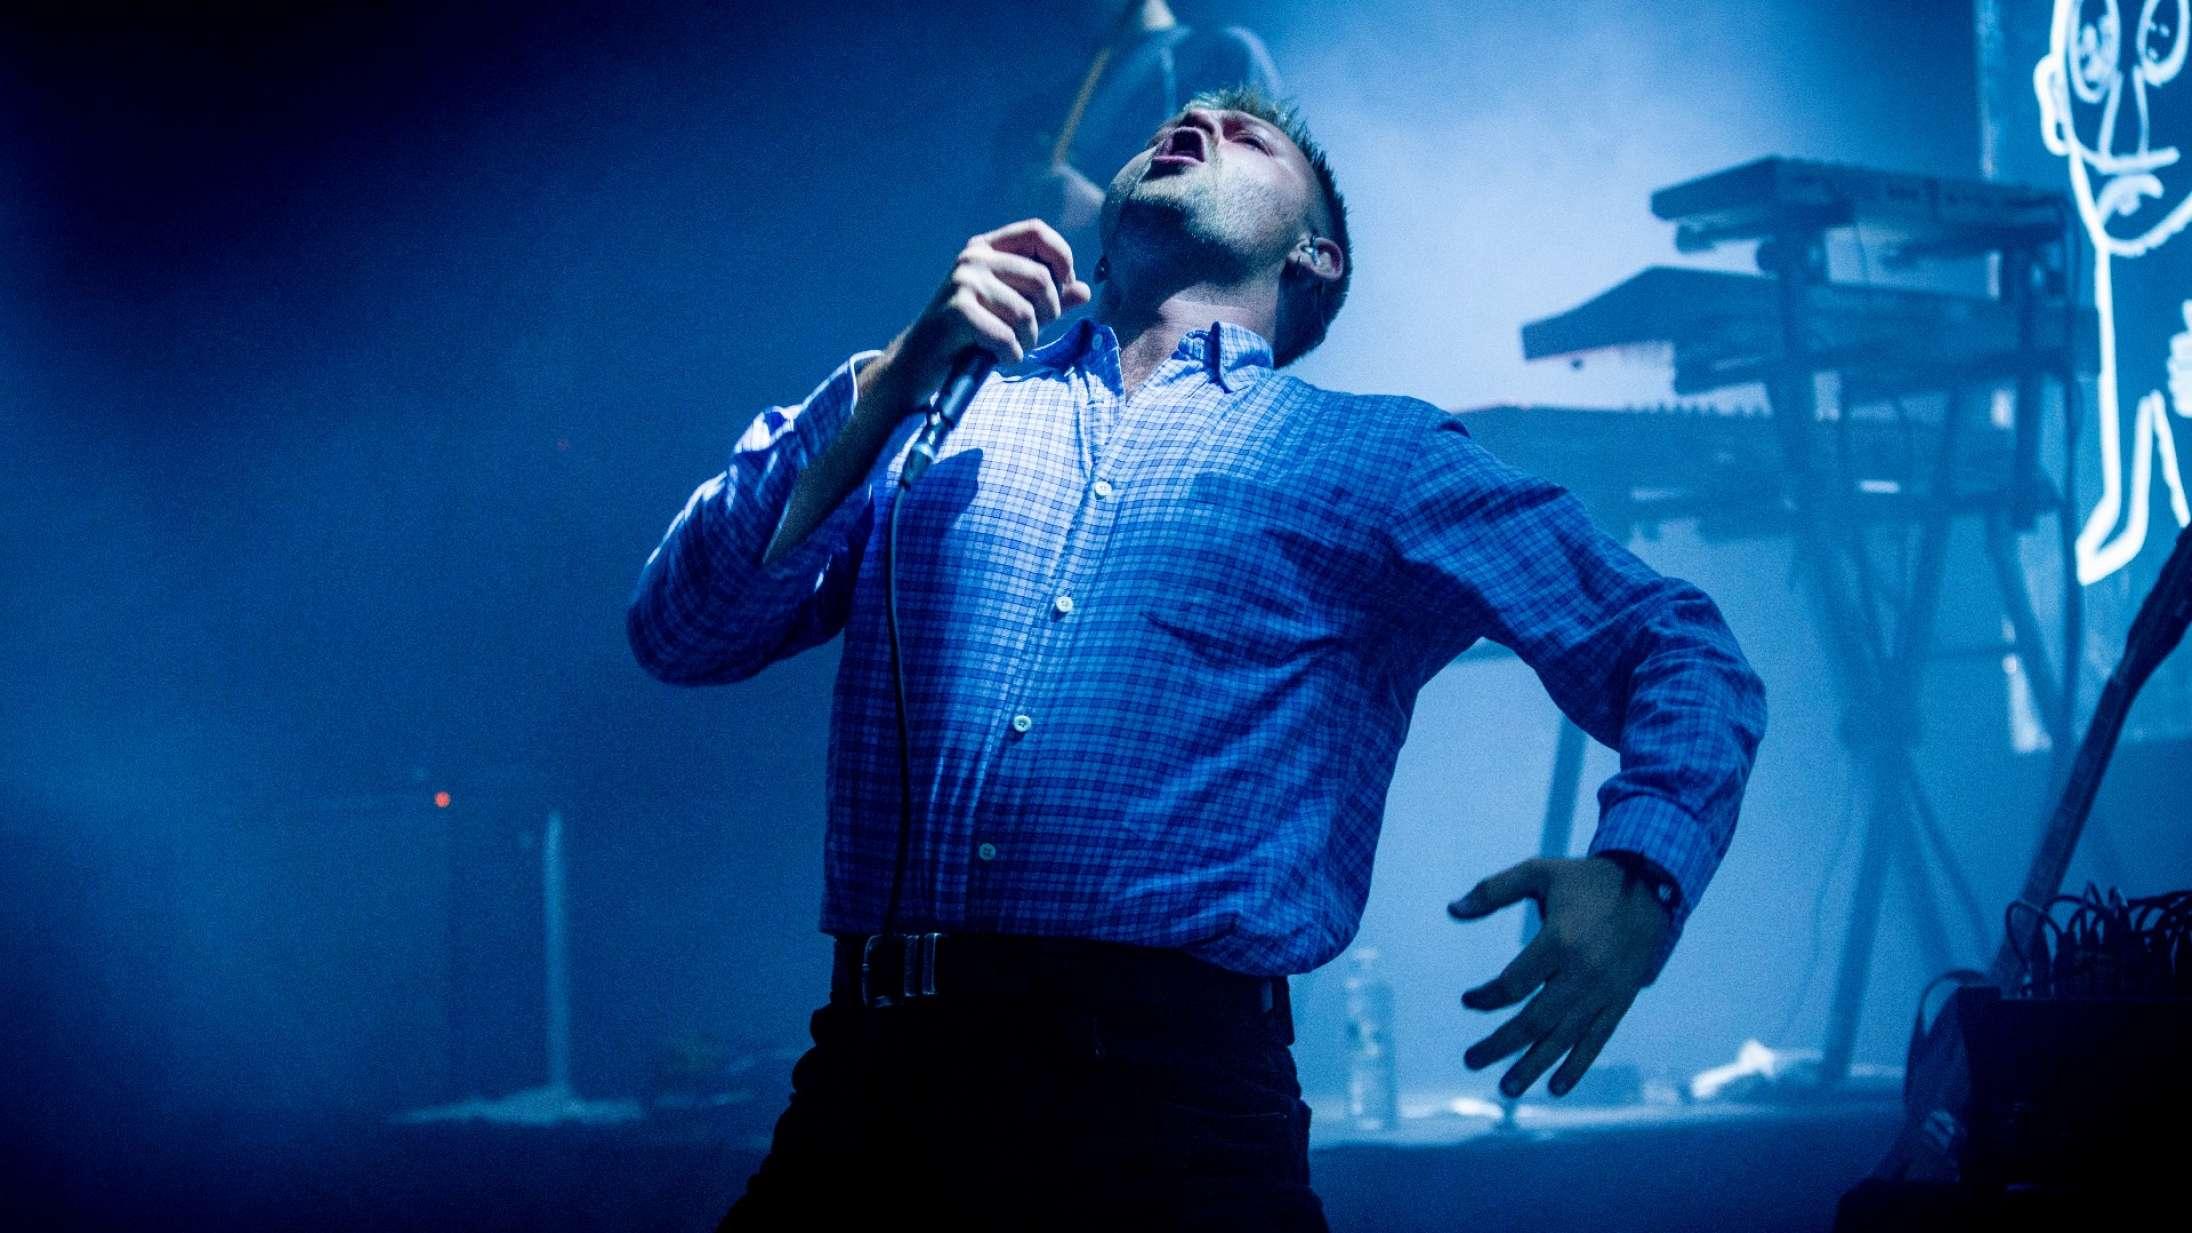 Joyces energiudladning skabte fællessang og forløsning på Spot Festival